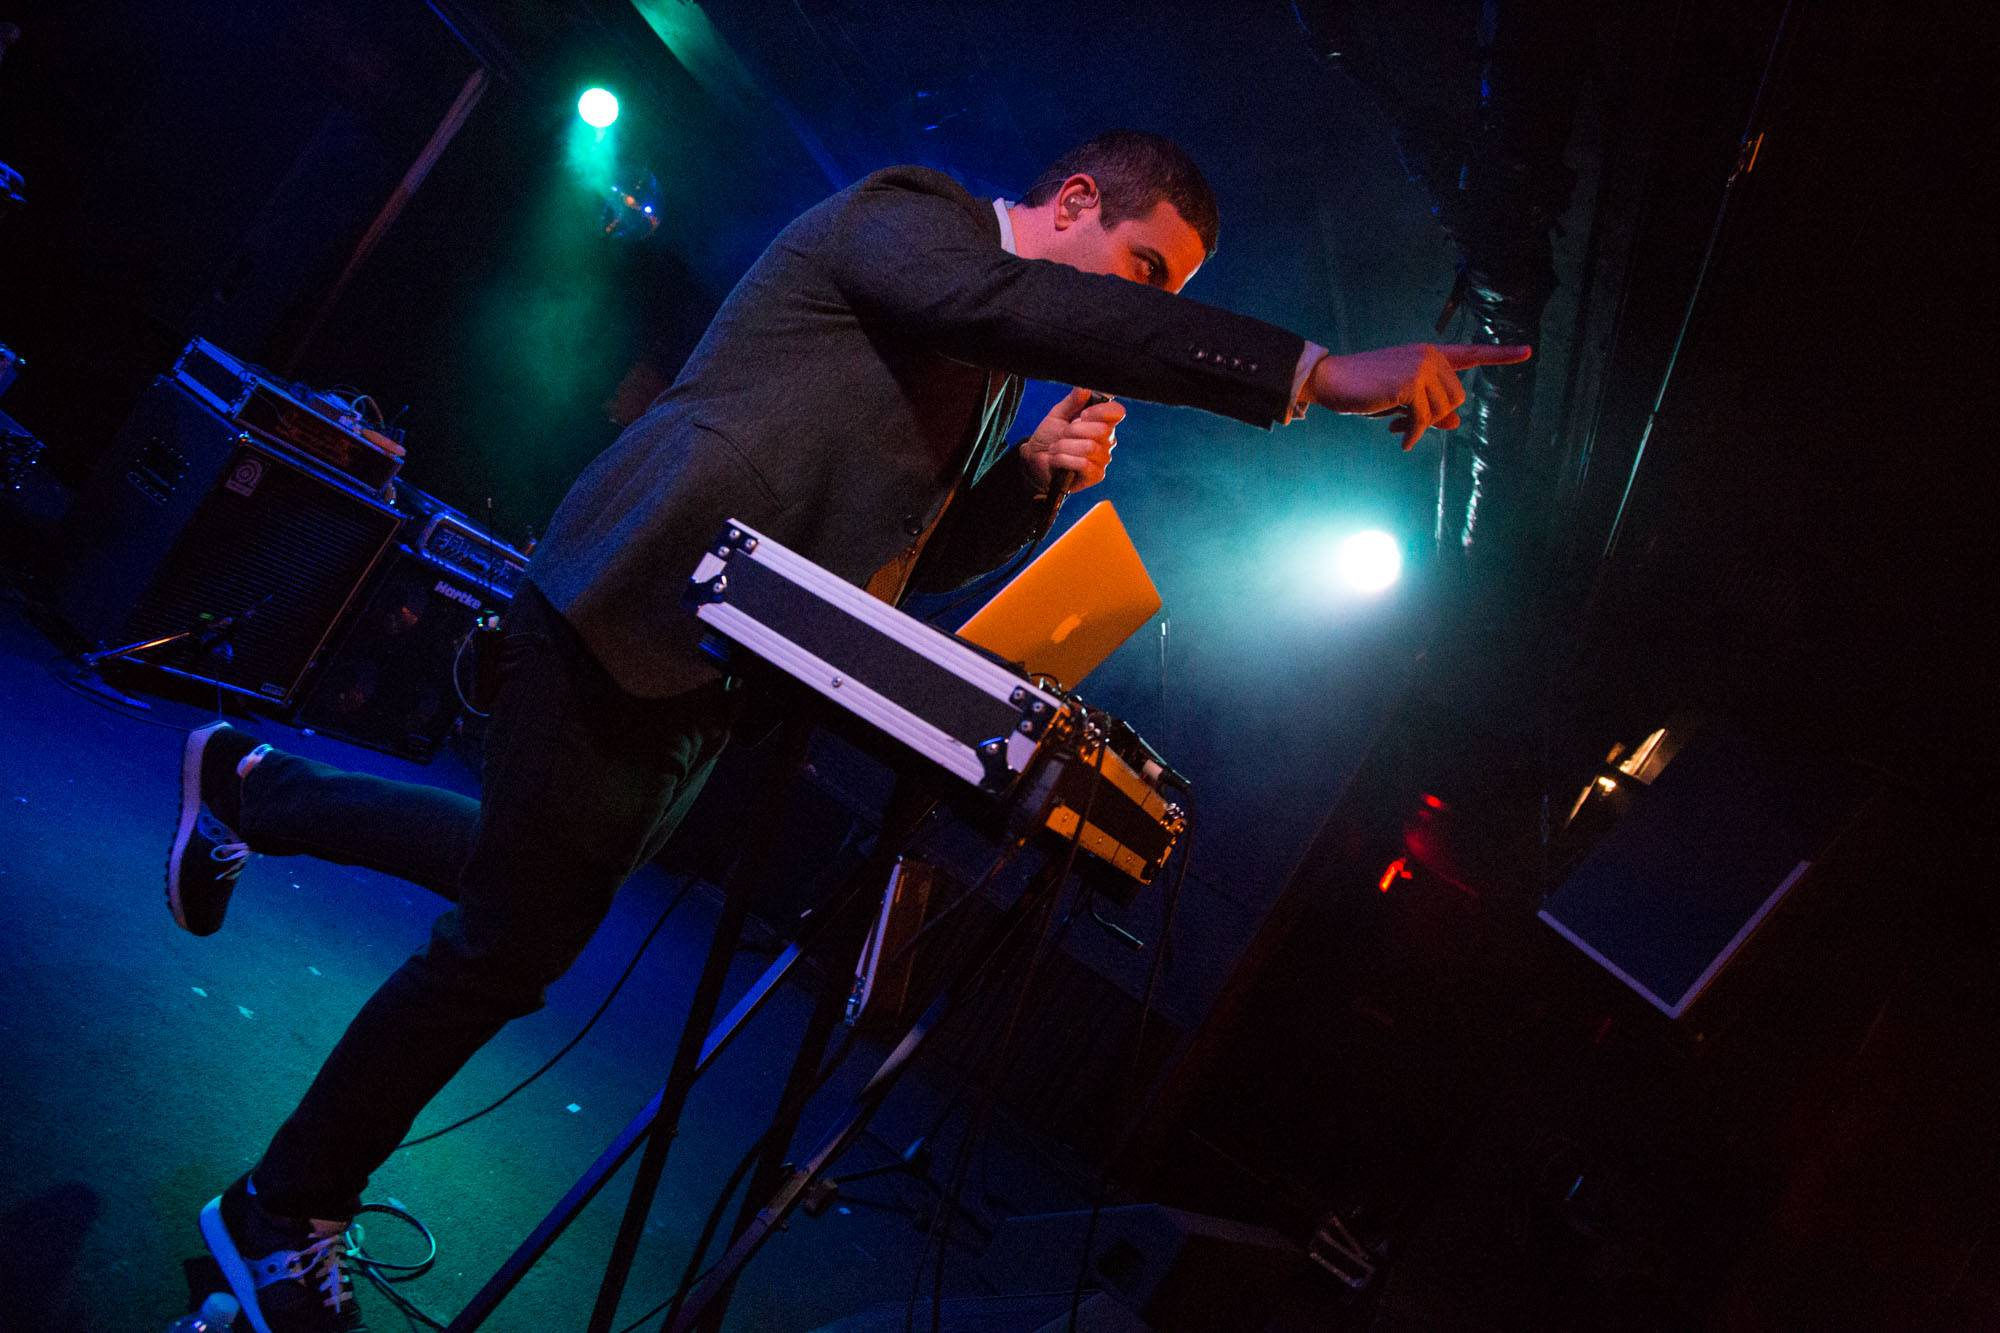 Say Hi at the Biltmore Cabaret, Vancouver, Oct 2 2015. Kirk Chantraine photo.